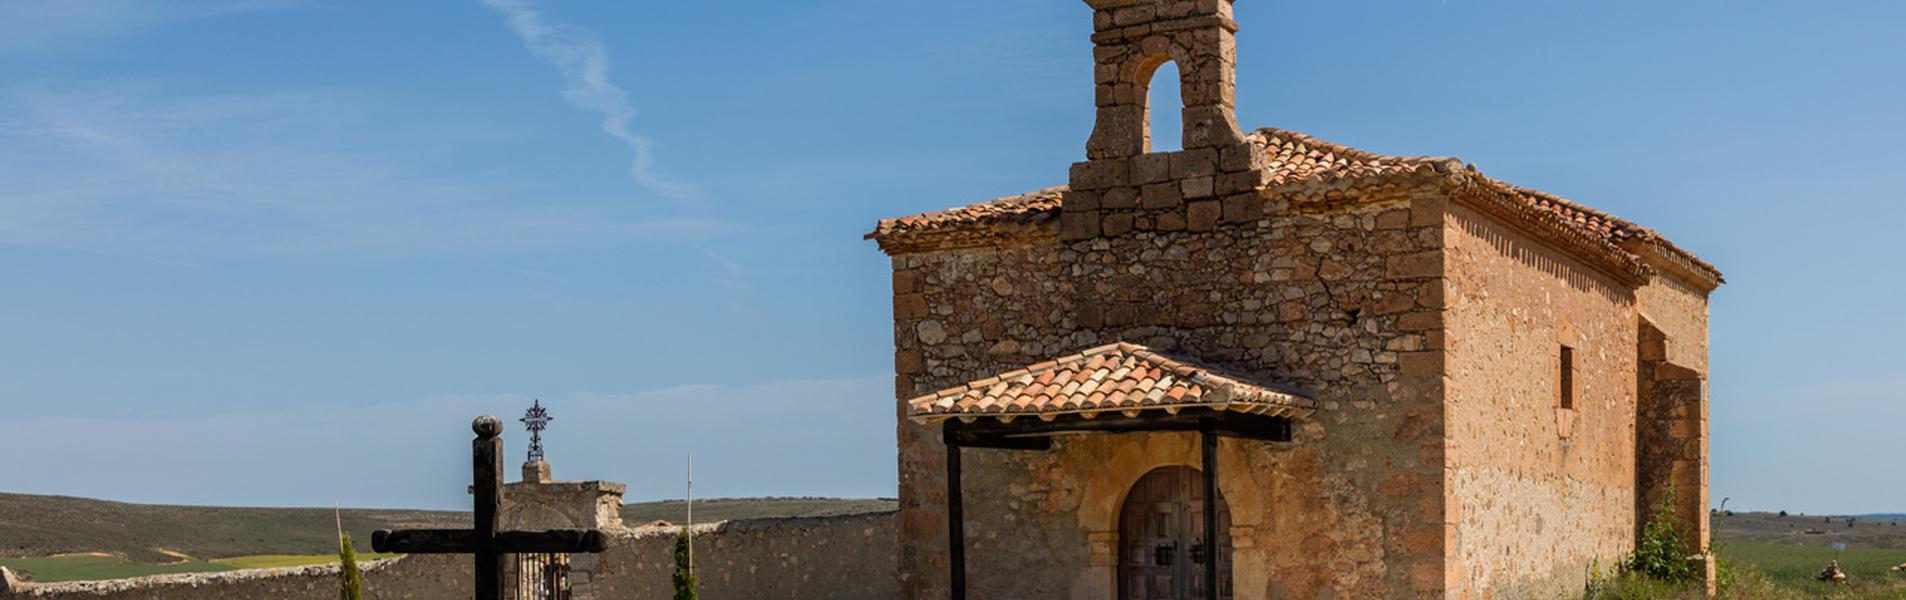 Villanueva de Gormaz